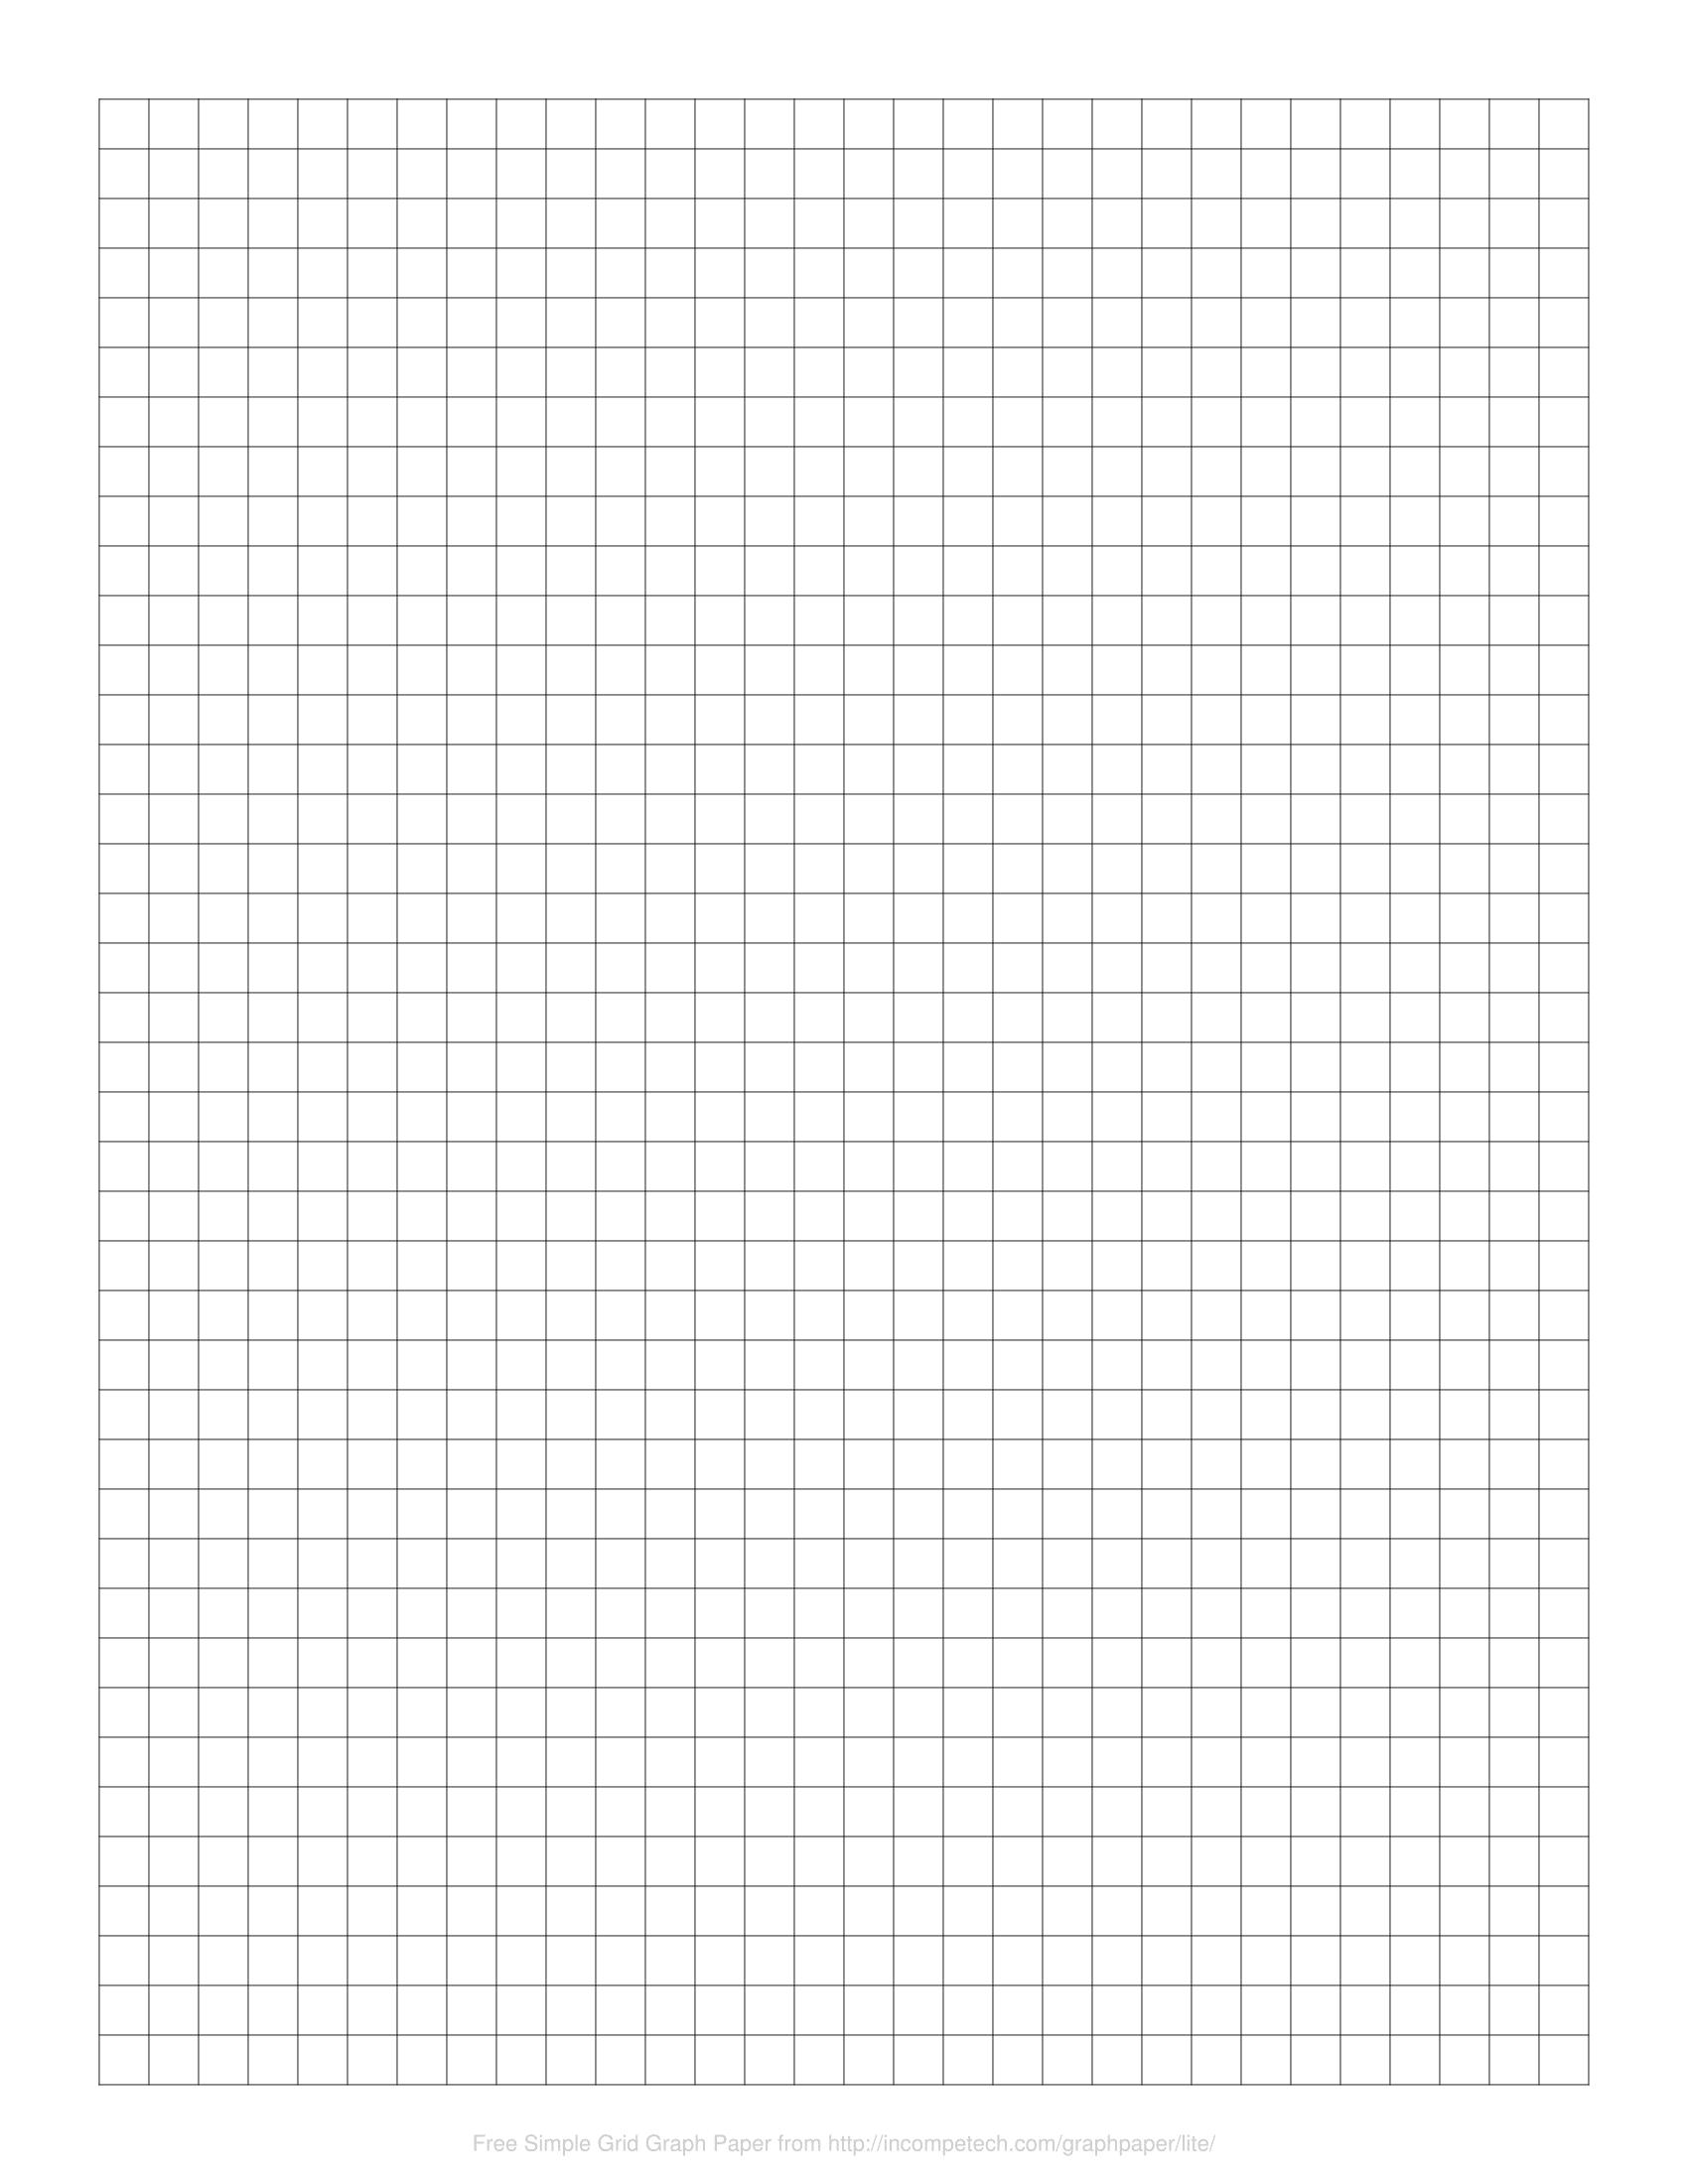 Digital Graph Paper Online